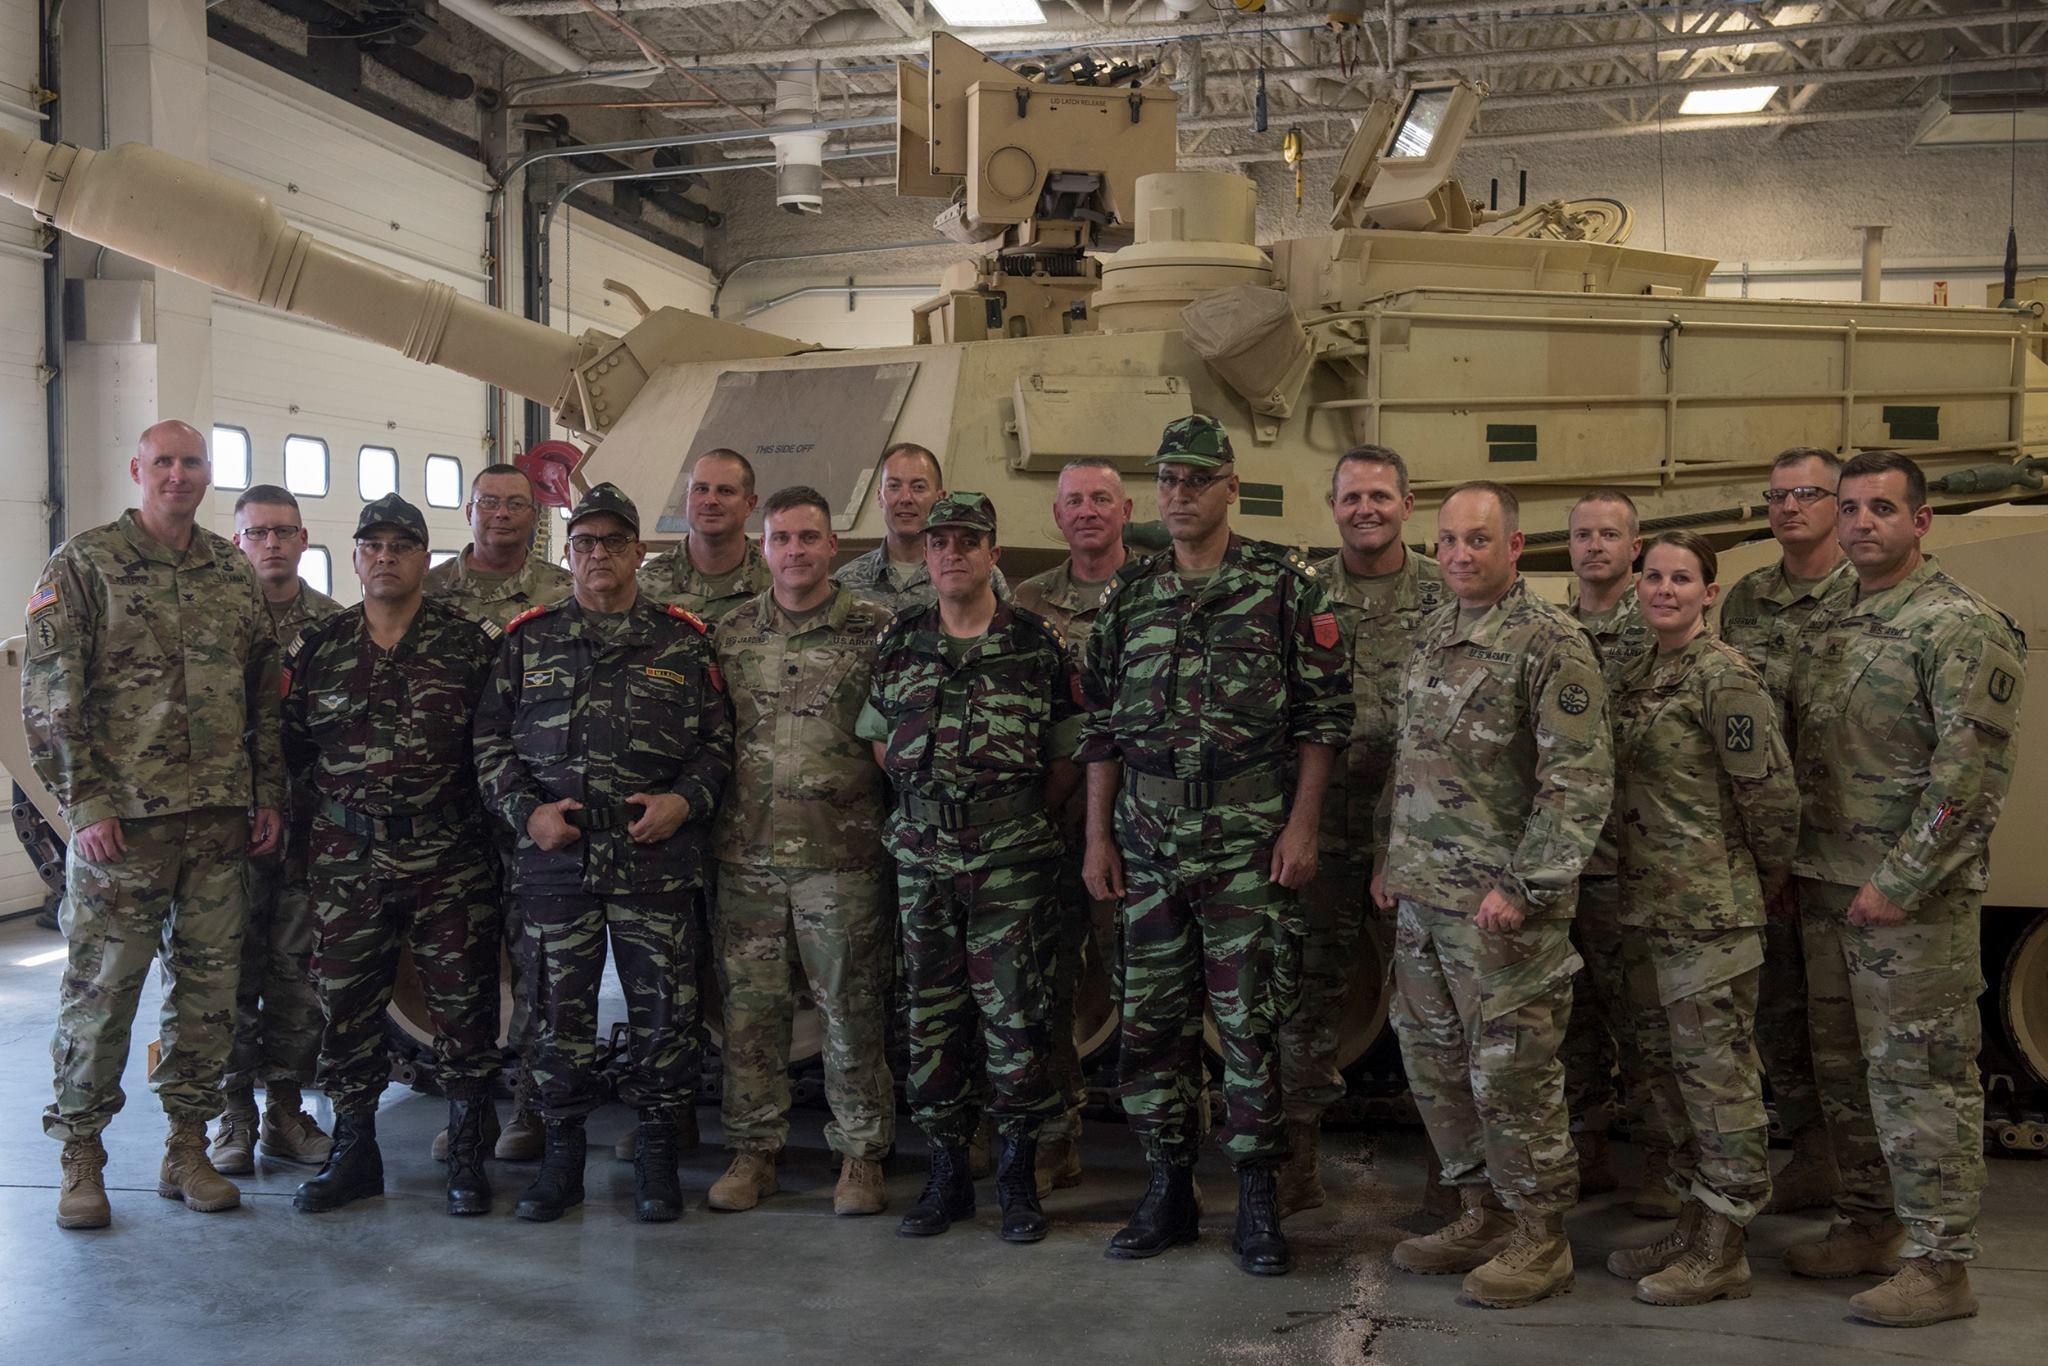 Cooperation militaire avec les USA - Page 7 39162610